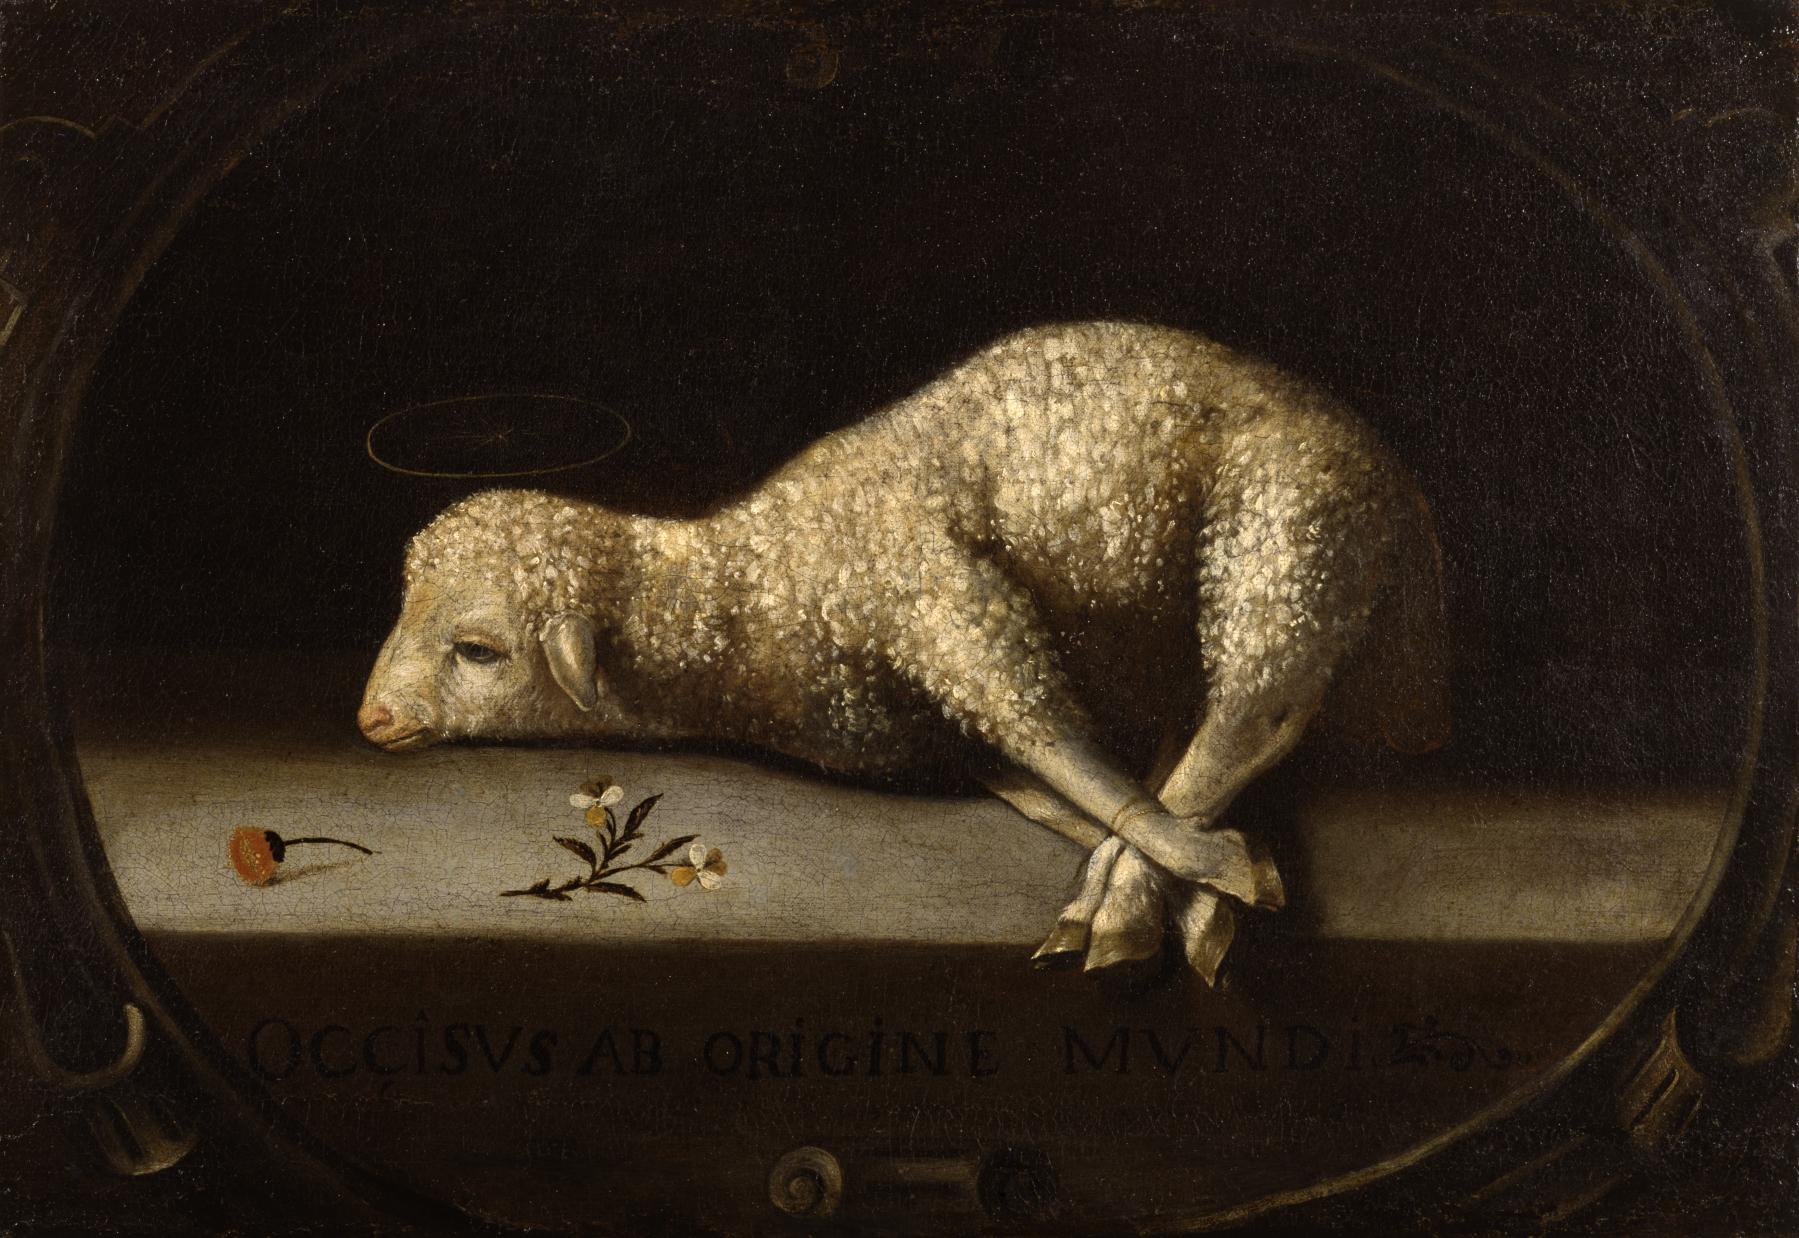 https://i2.wp.com/upload.wikimedia.org/wikipedia/commons/9/97/Josefa_de_Ayala_-_The_Sacrificial_Lamb_-_Walters_371193.jpg